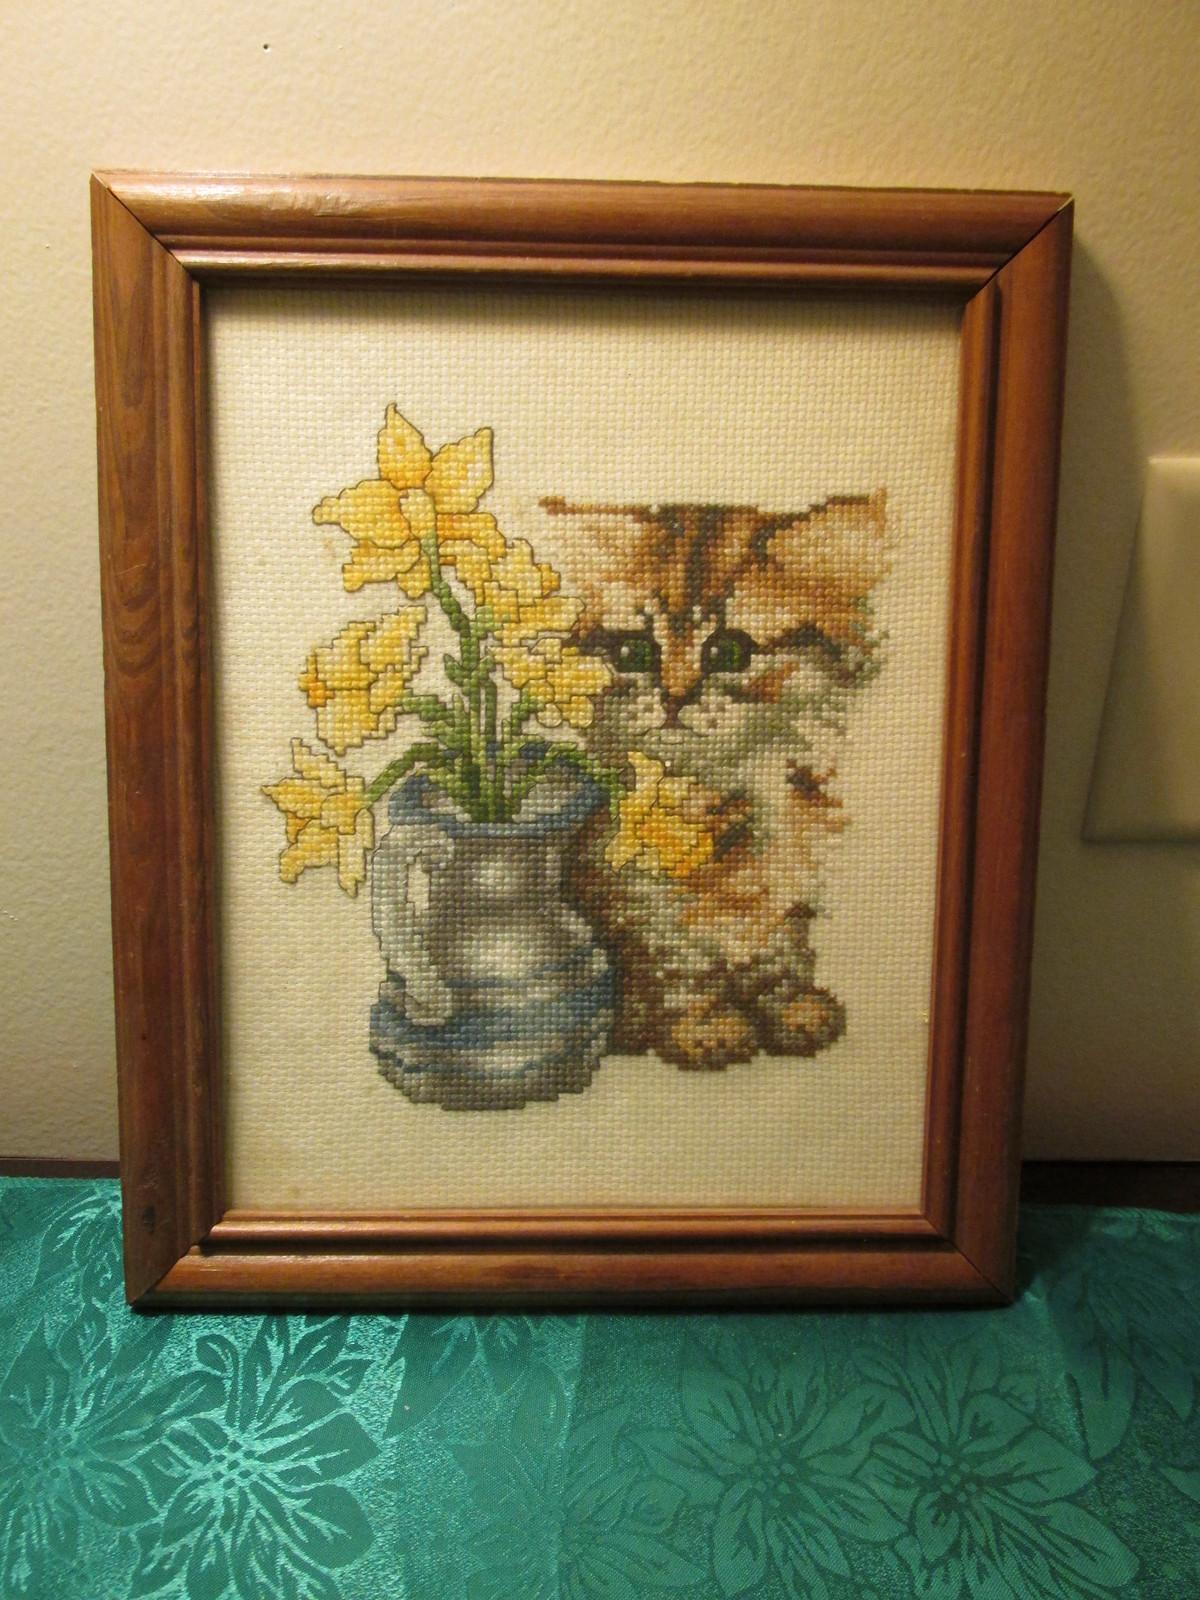 Framed Cross Stitch Kitten Picture